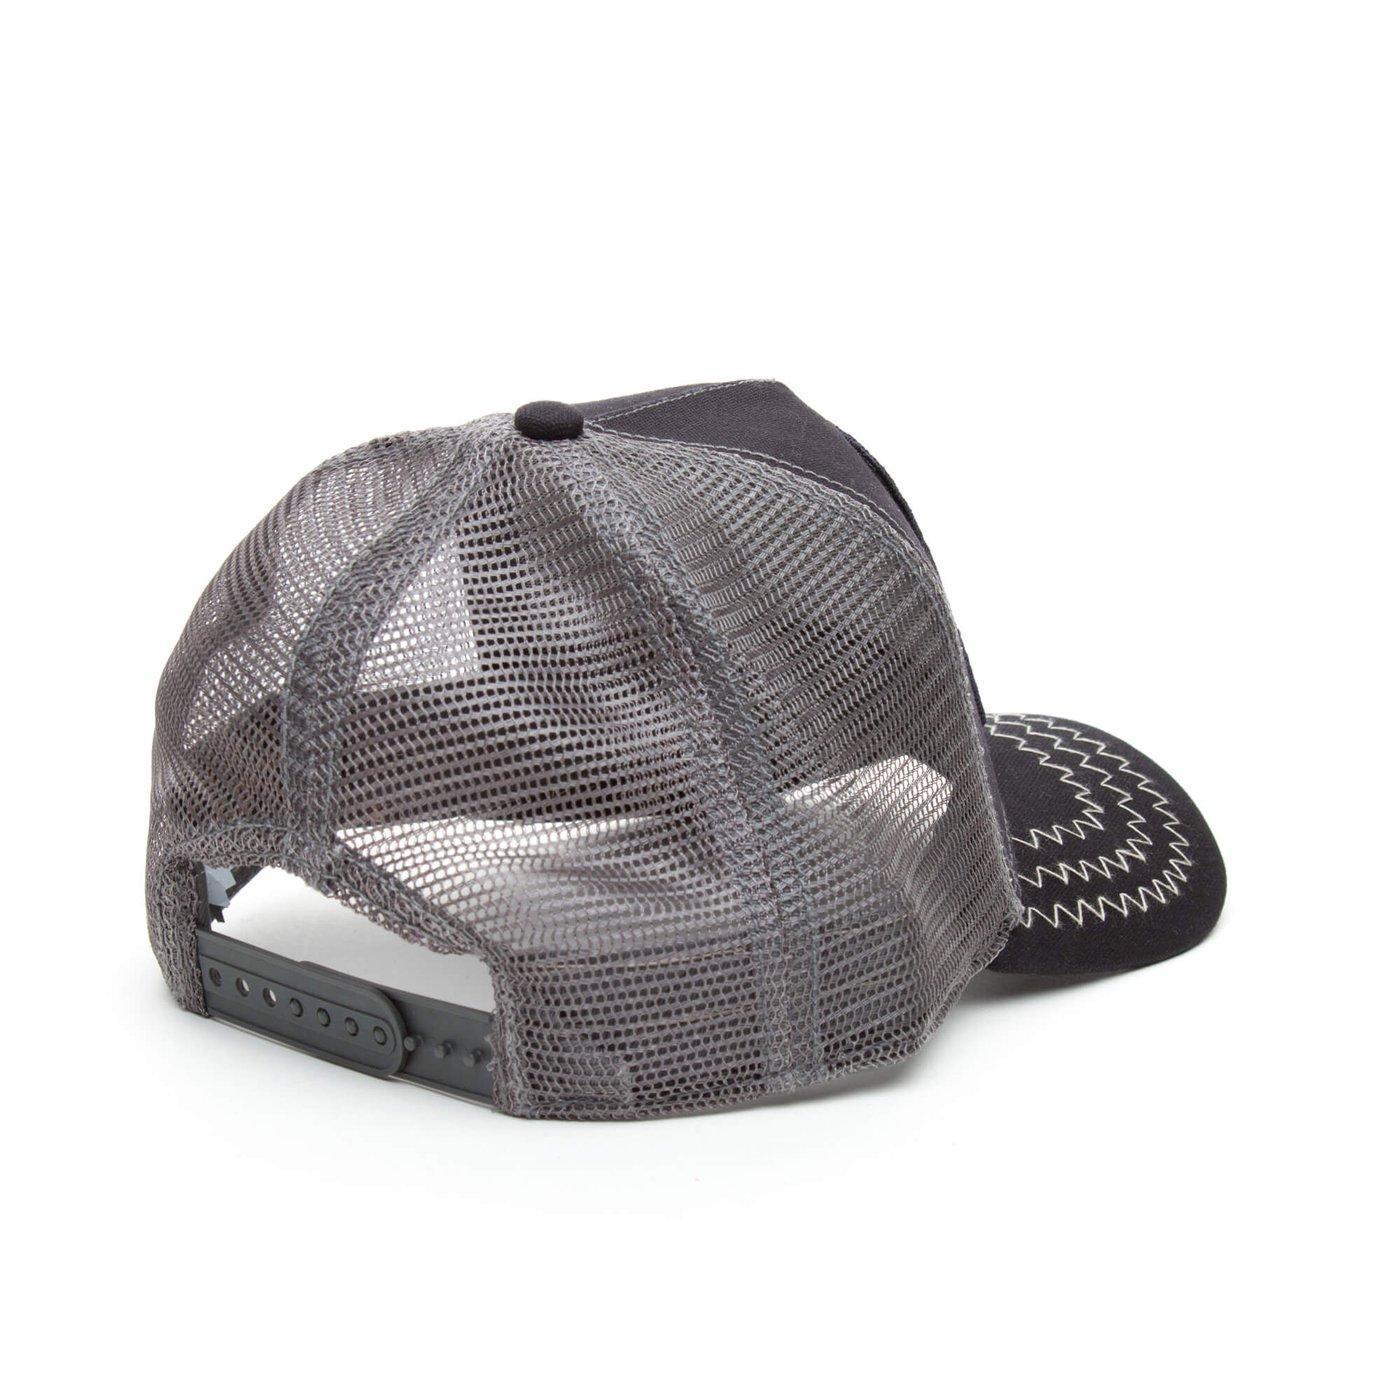 Goorin Bros Squirrel Master Unisex Lacivert Şapka